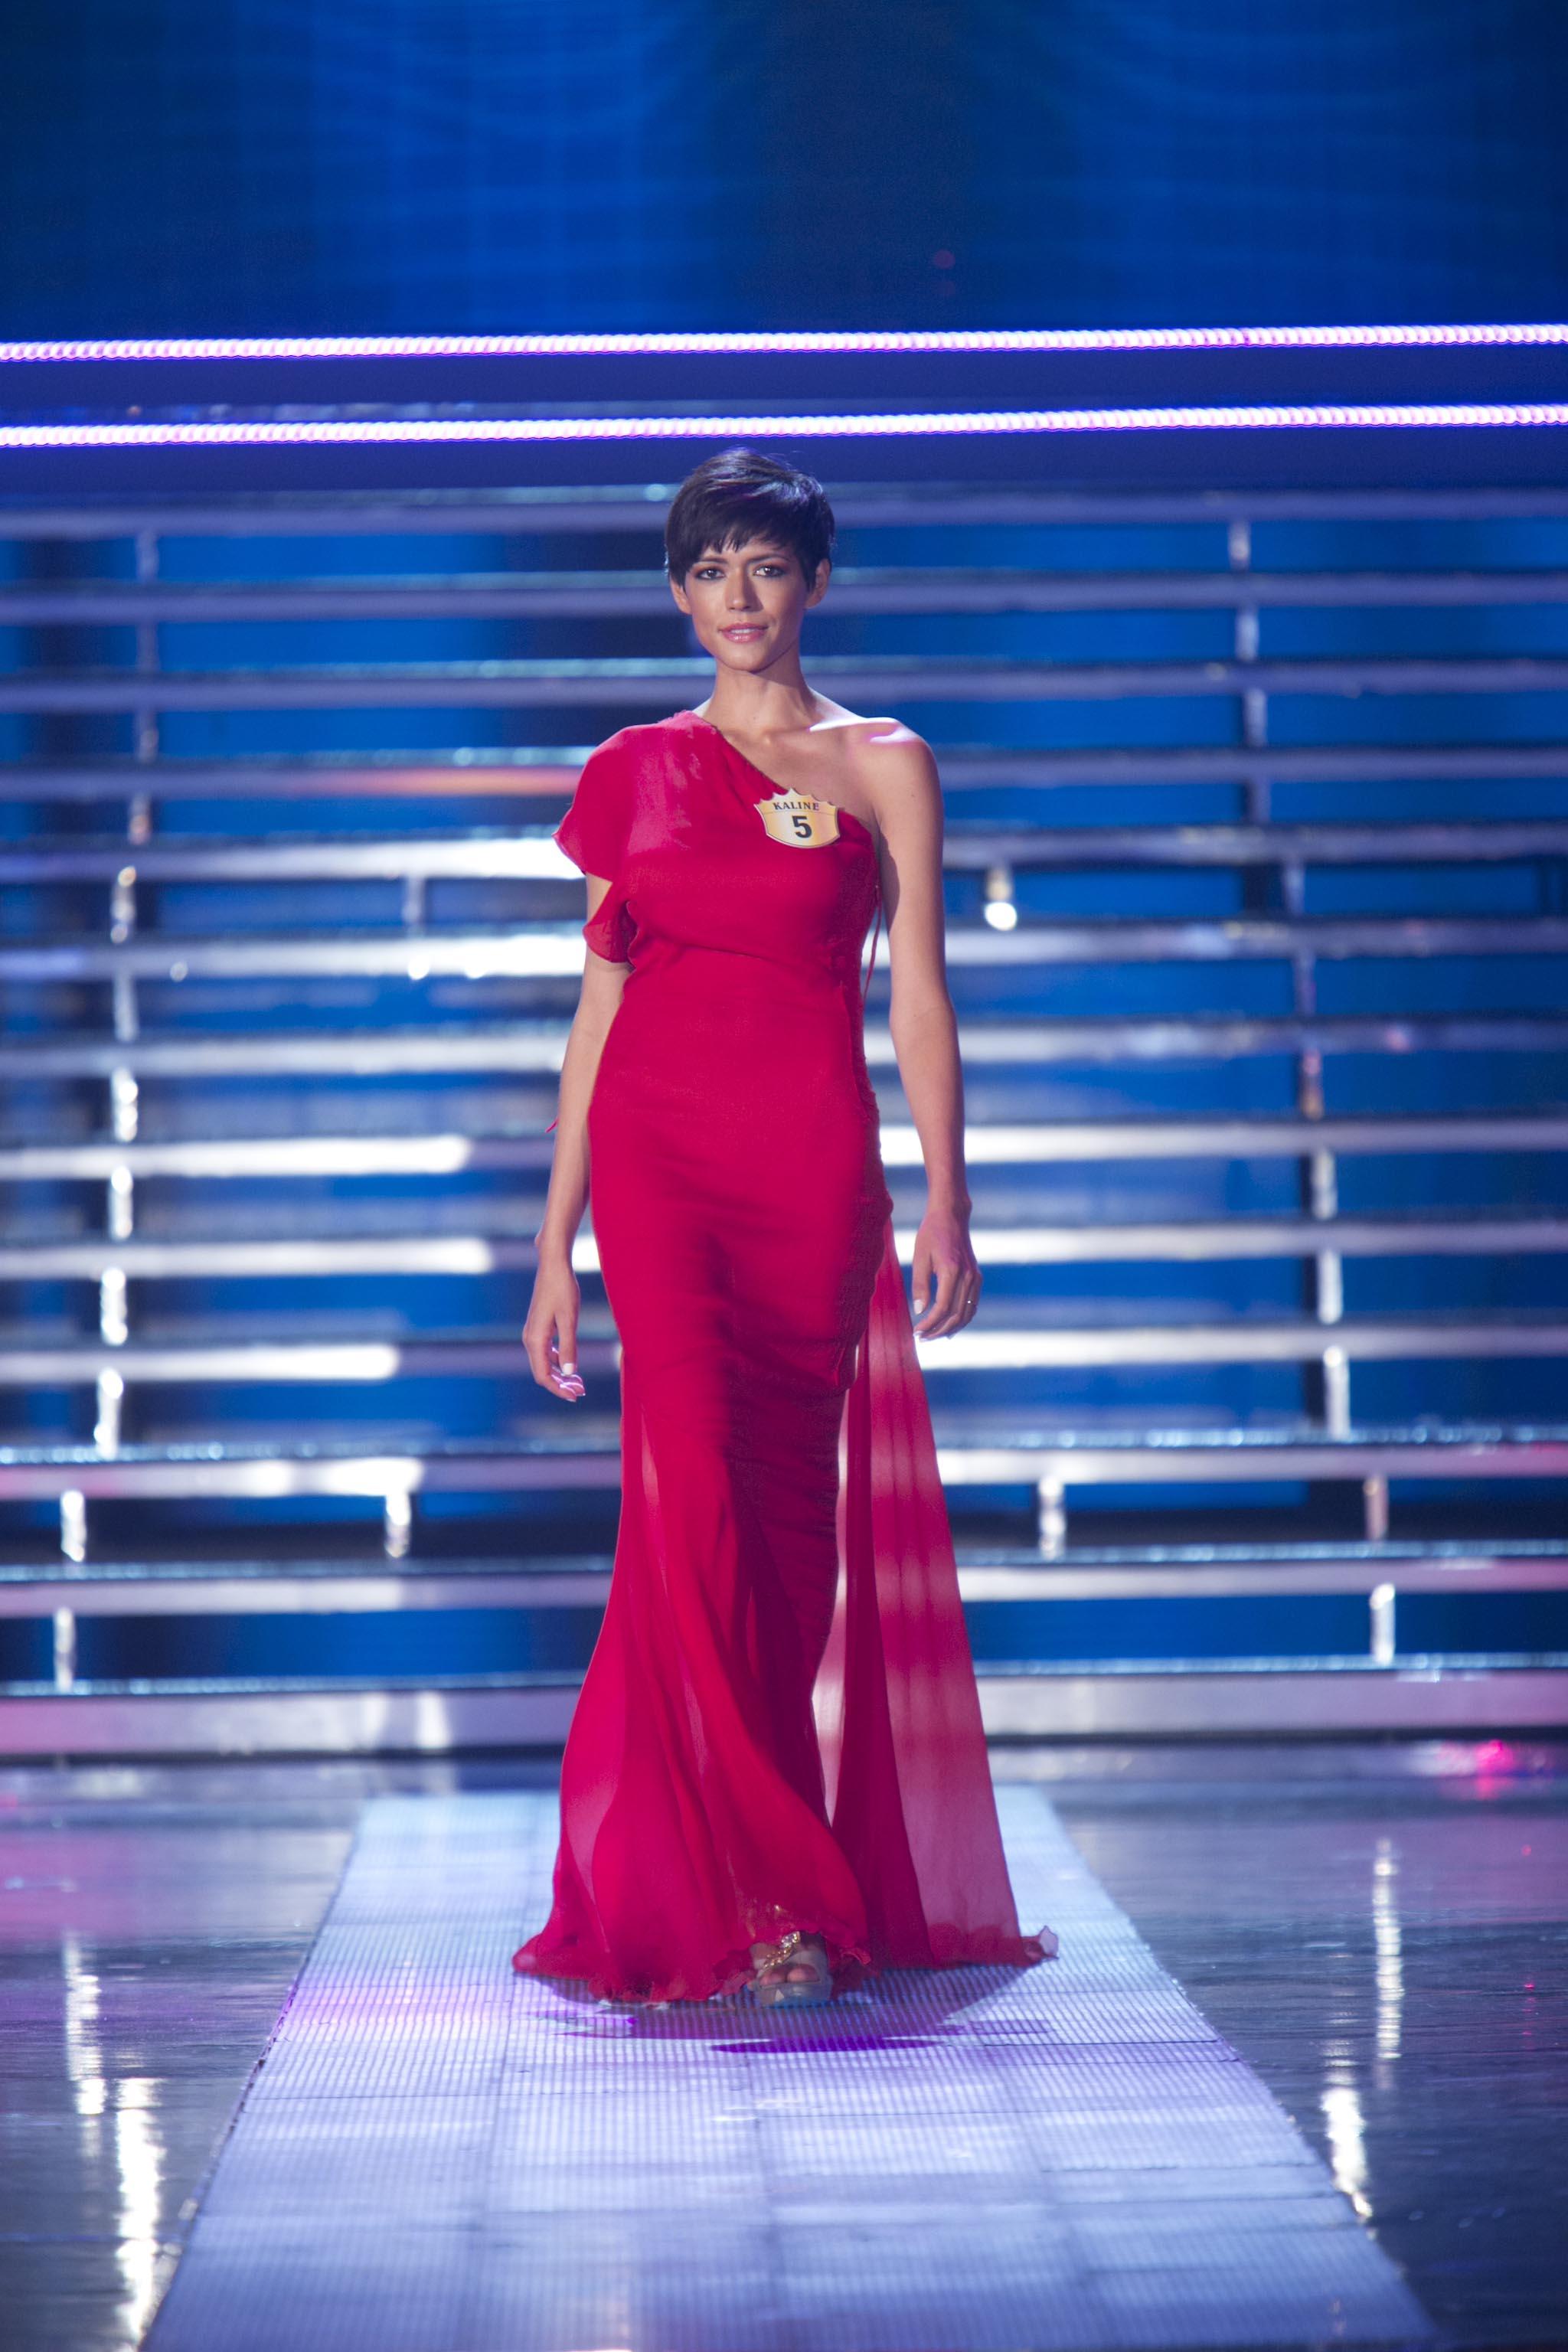 b4146436bff87 Miss Italia  la brasiliana Kaline Basilio De Souza nuovo volto Sarli